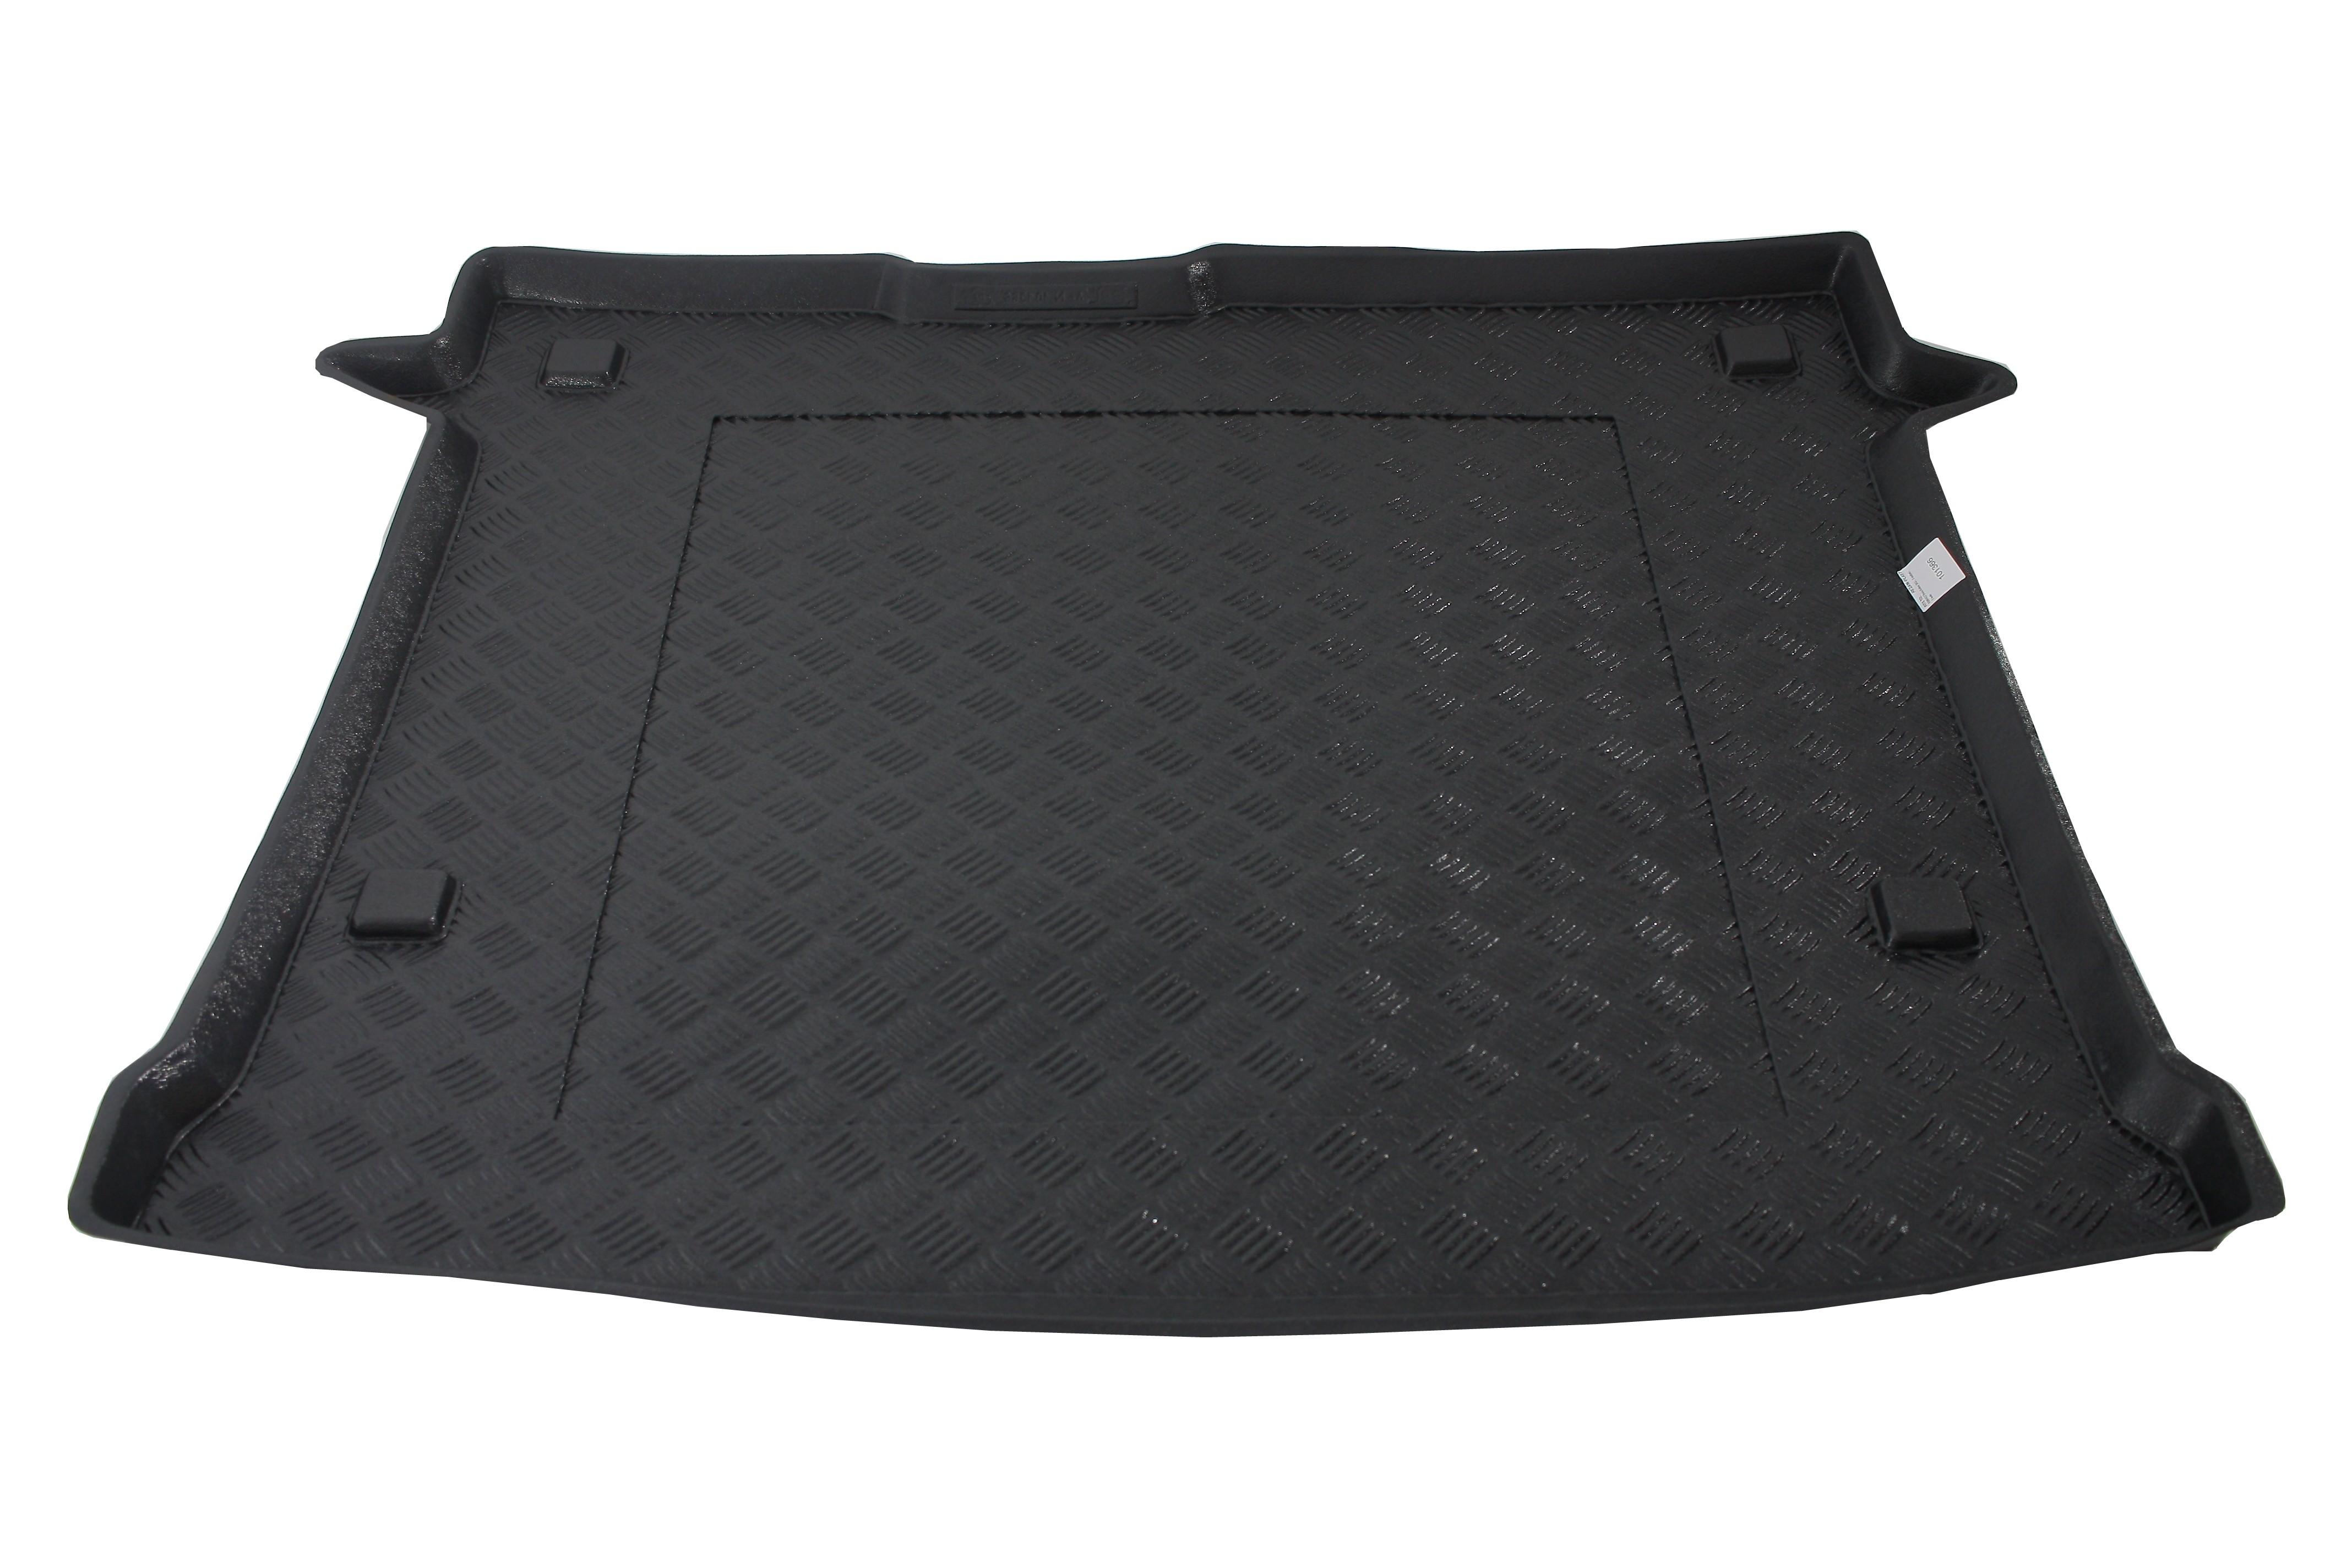 Covoras tavita portbagaj compatibil cu RENAULT Dacia Dokker 2012- 0